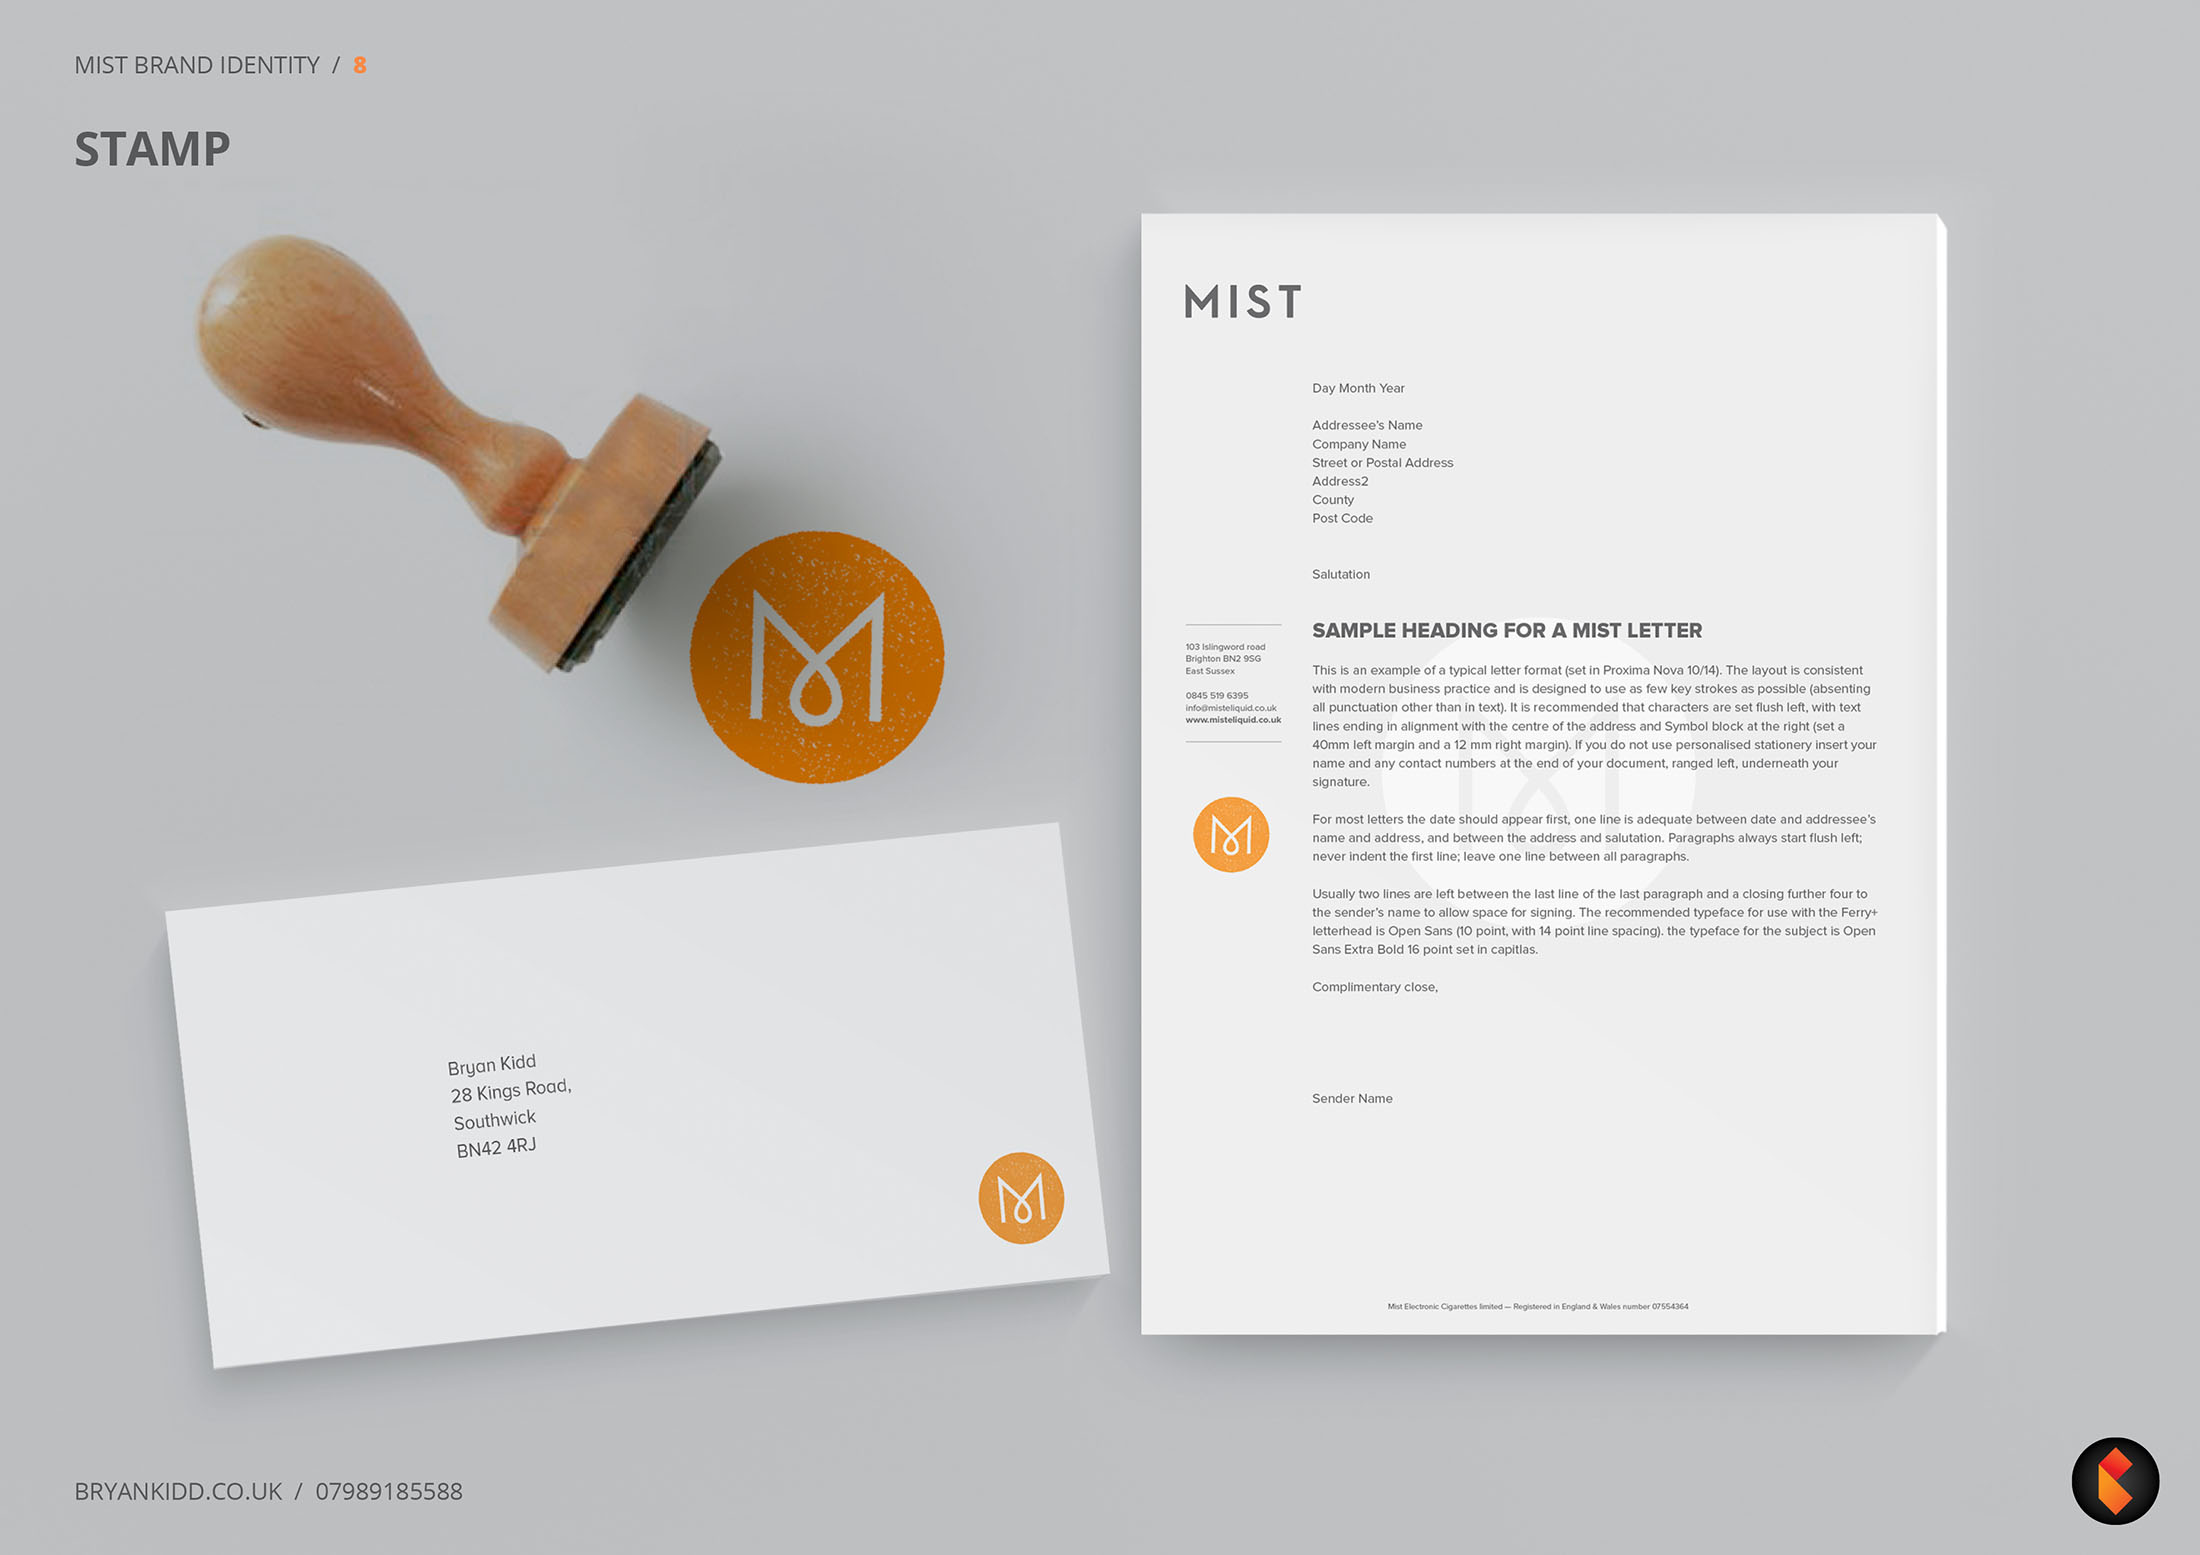 mist_presentation8